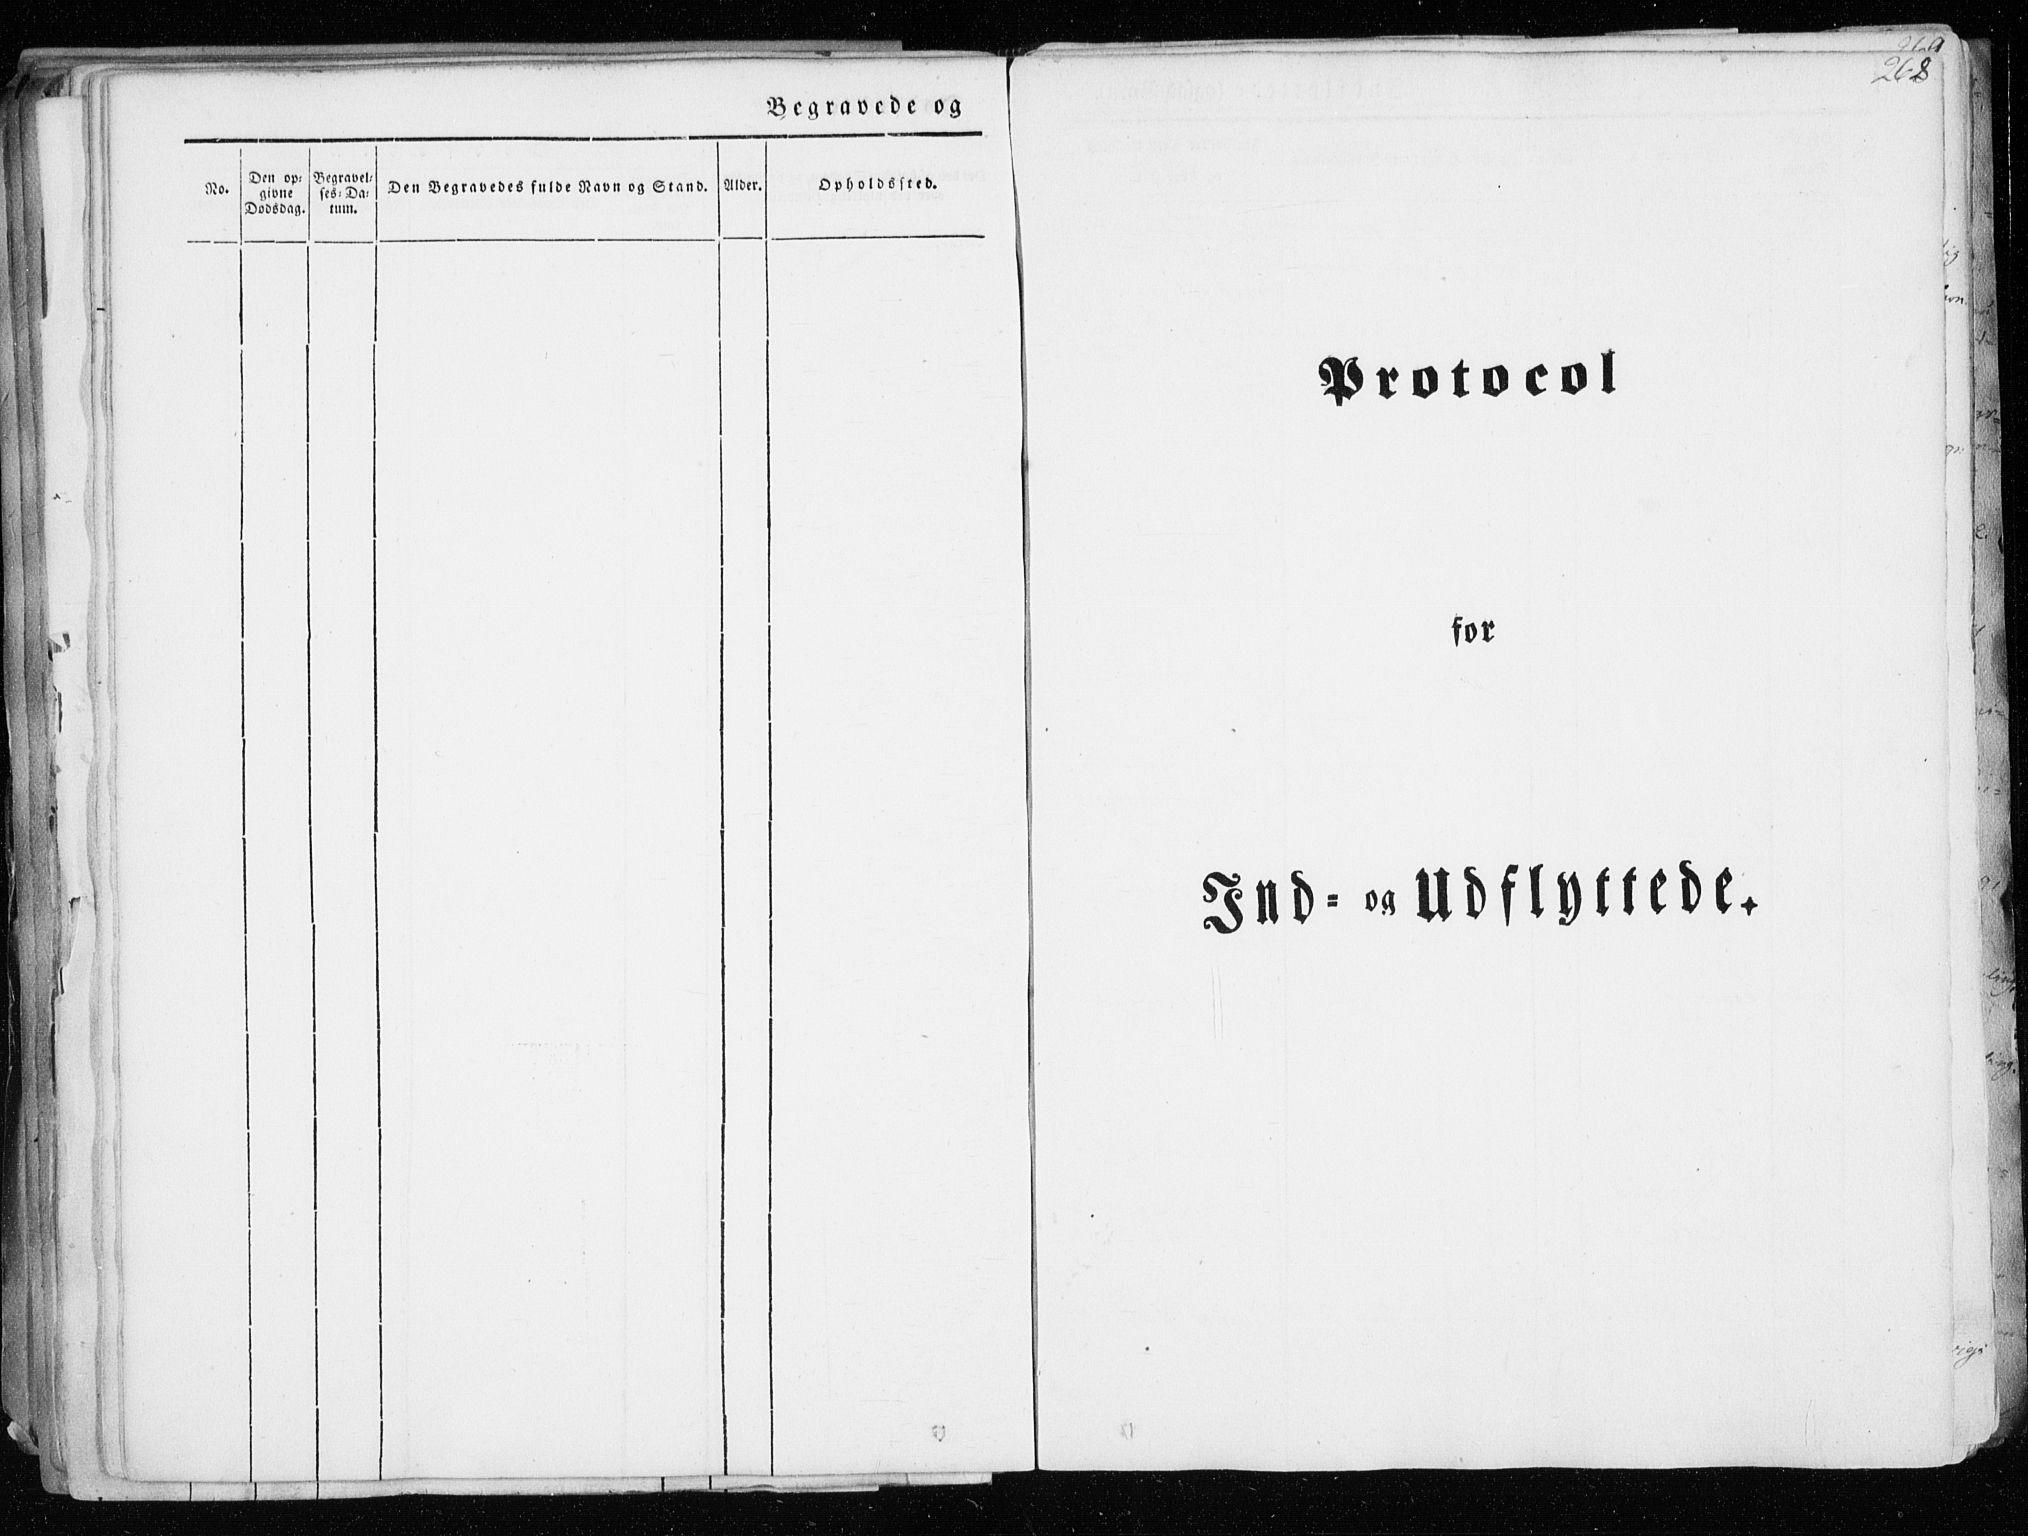 SATØ, Tranøy sokneprestkontor, I/Ia/Iaa/L0006kirke: Ministerialbok nr. 6, 1844-1855, s. 268